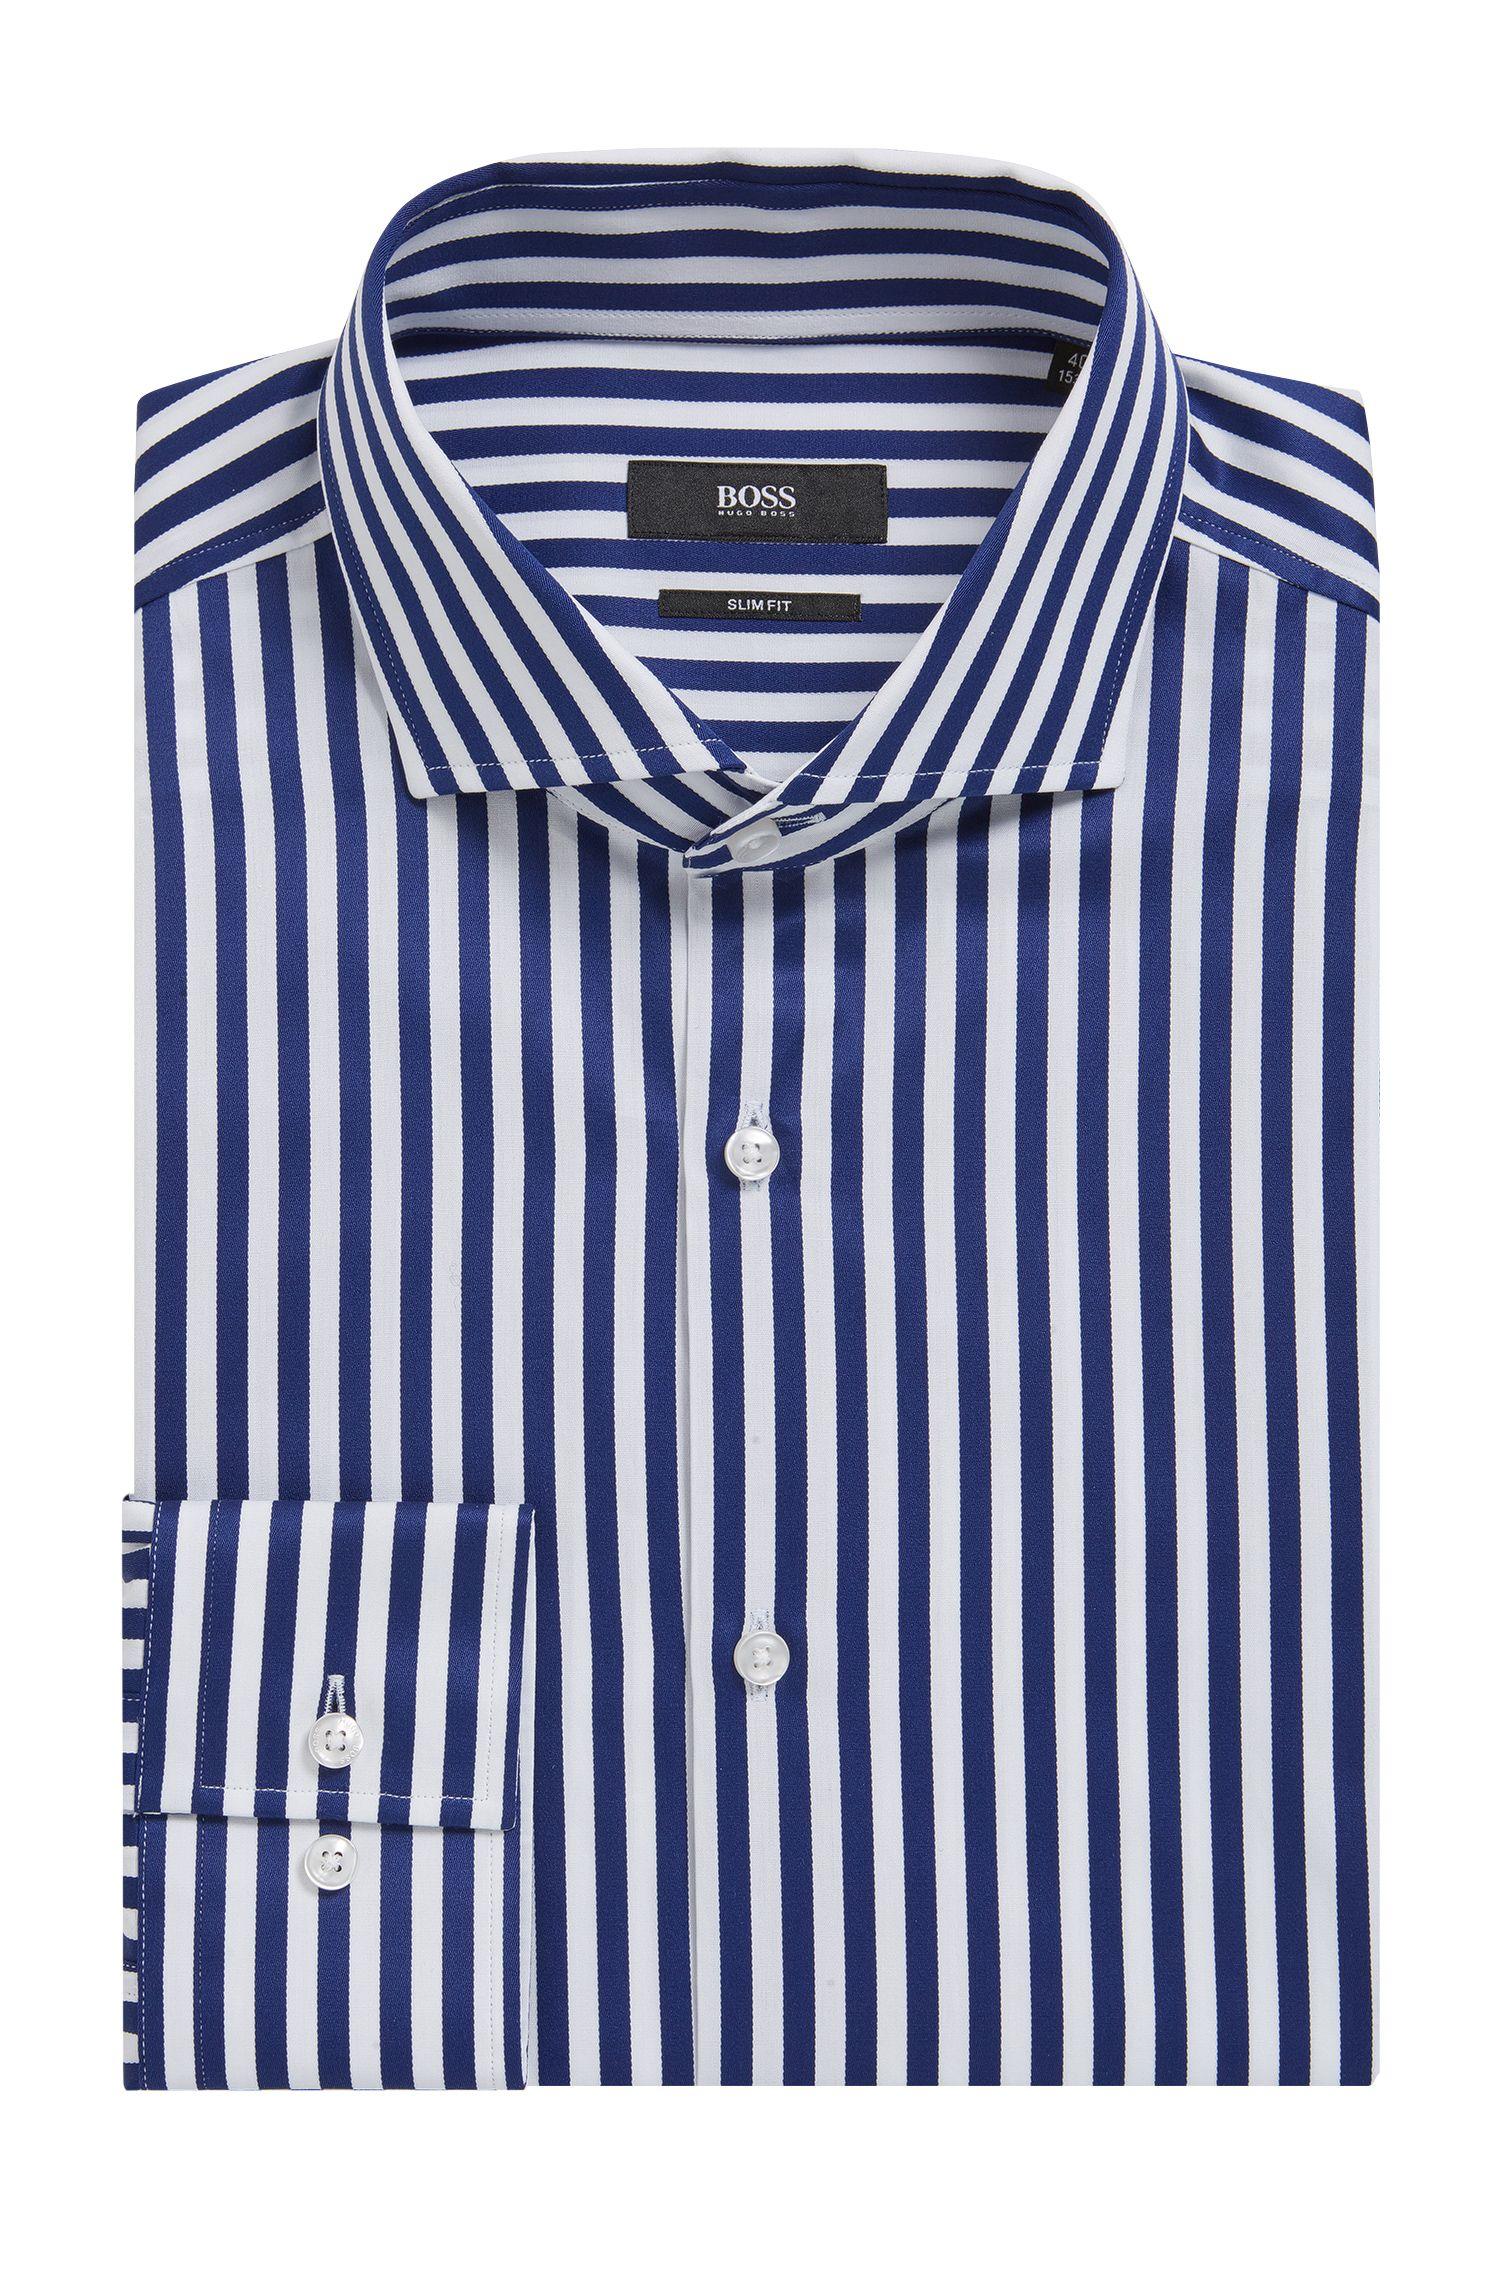 'Jason' | Slim Fit, Striped Cotton Dress Shirt